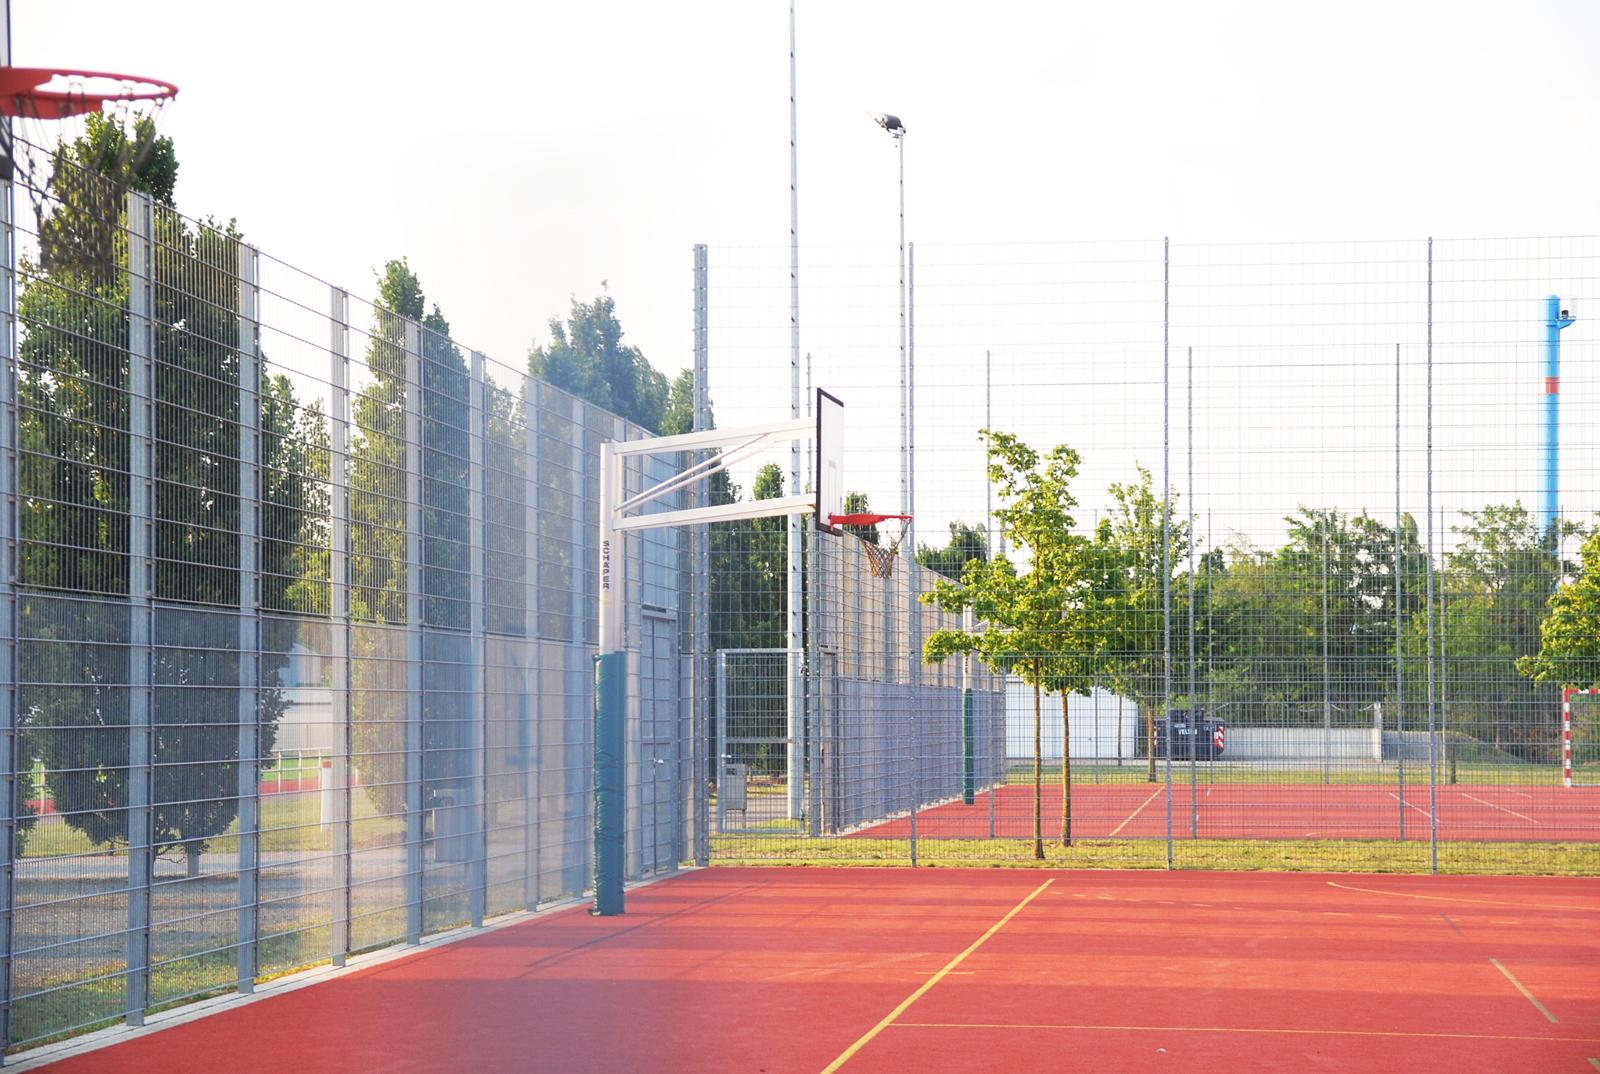 OSZ-technik-henningsdorf-sportfreiflaechen-landschaftsarchitektur-berlin-albert-armbruster